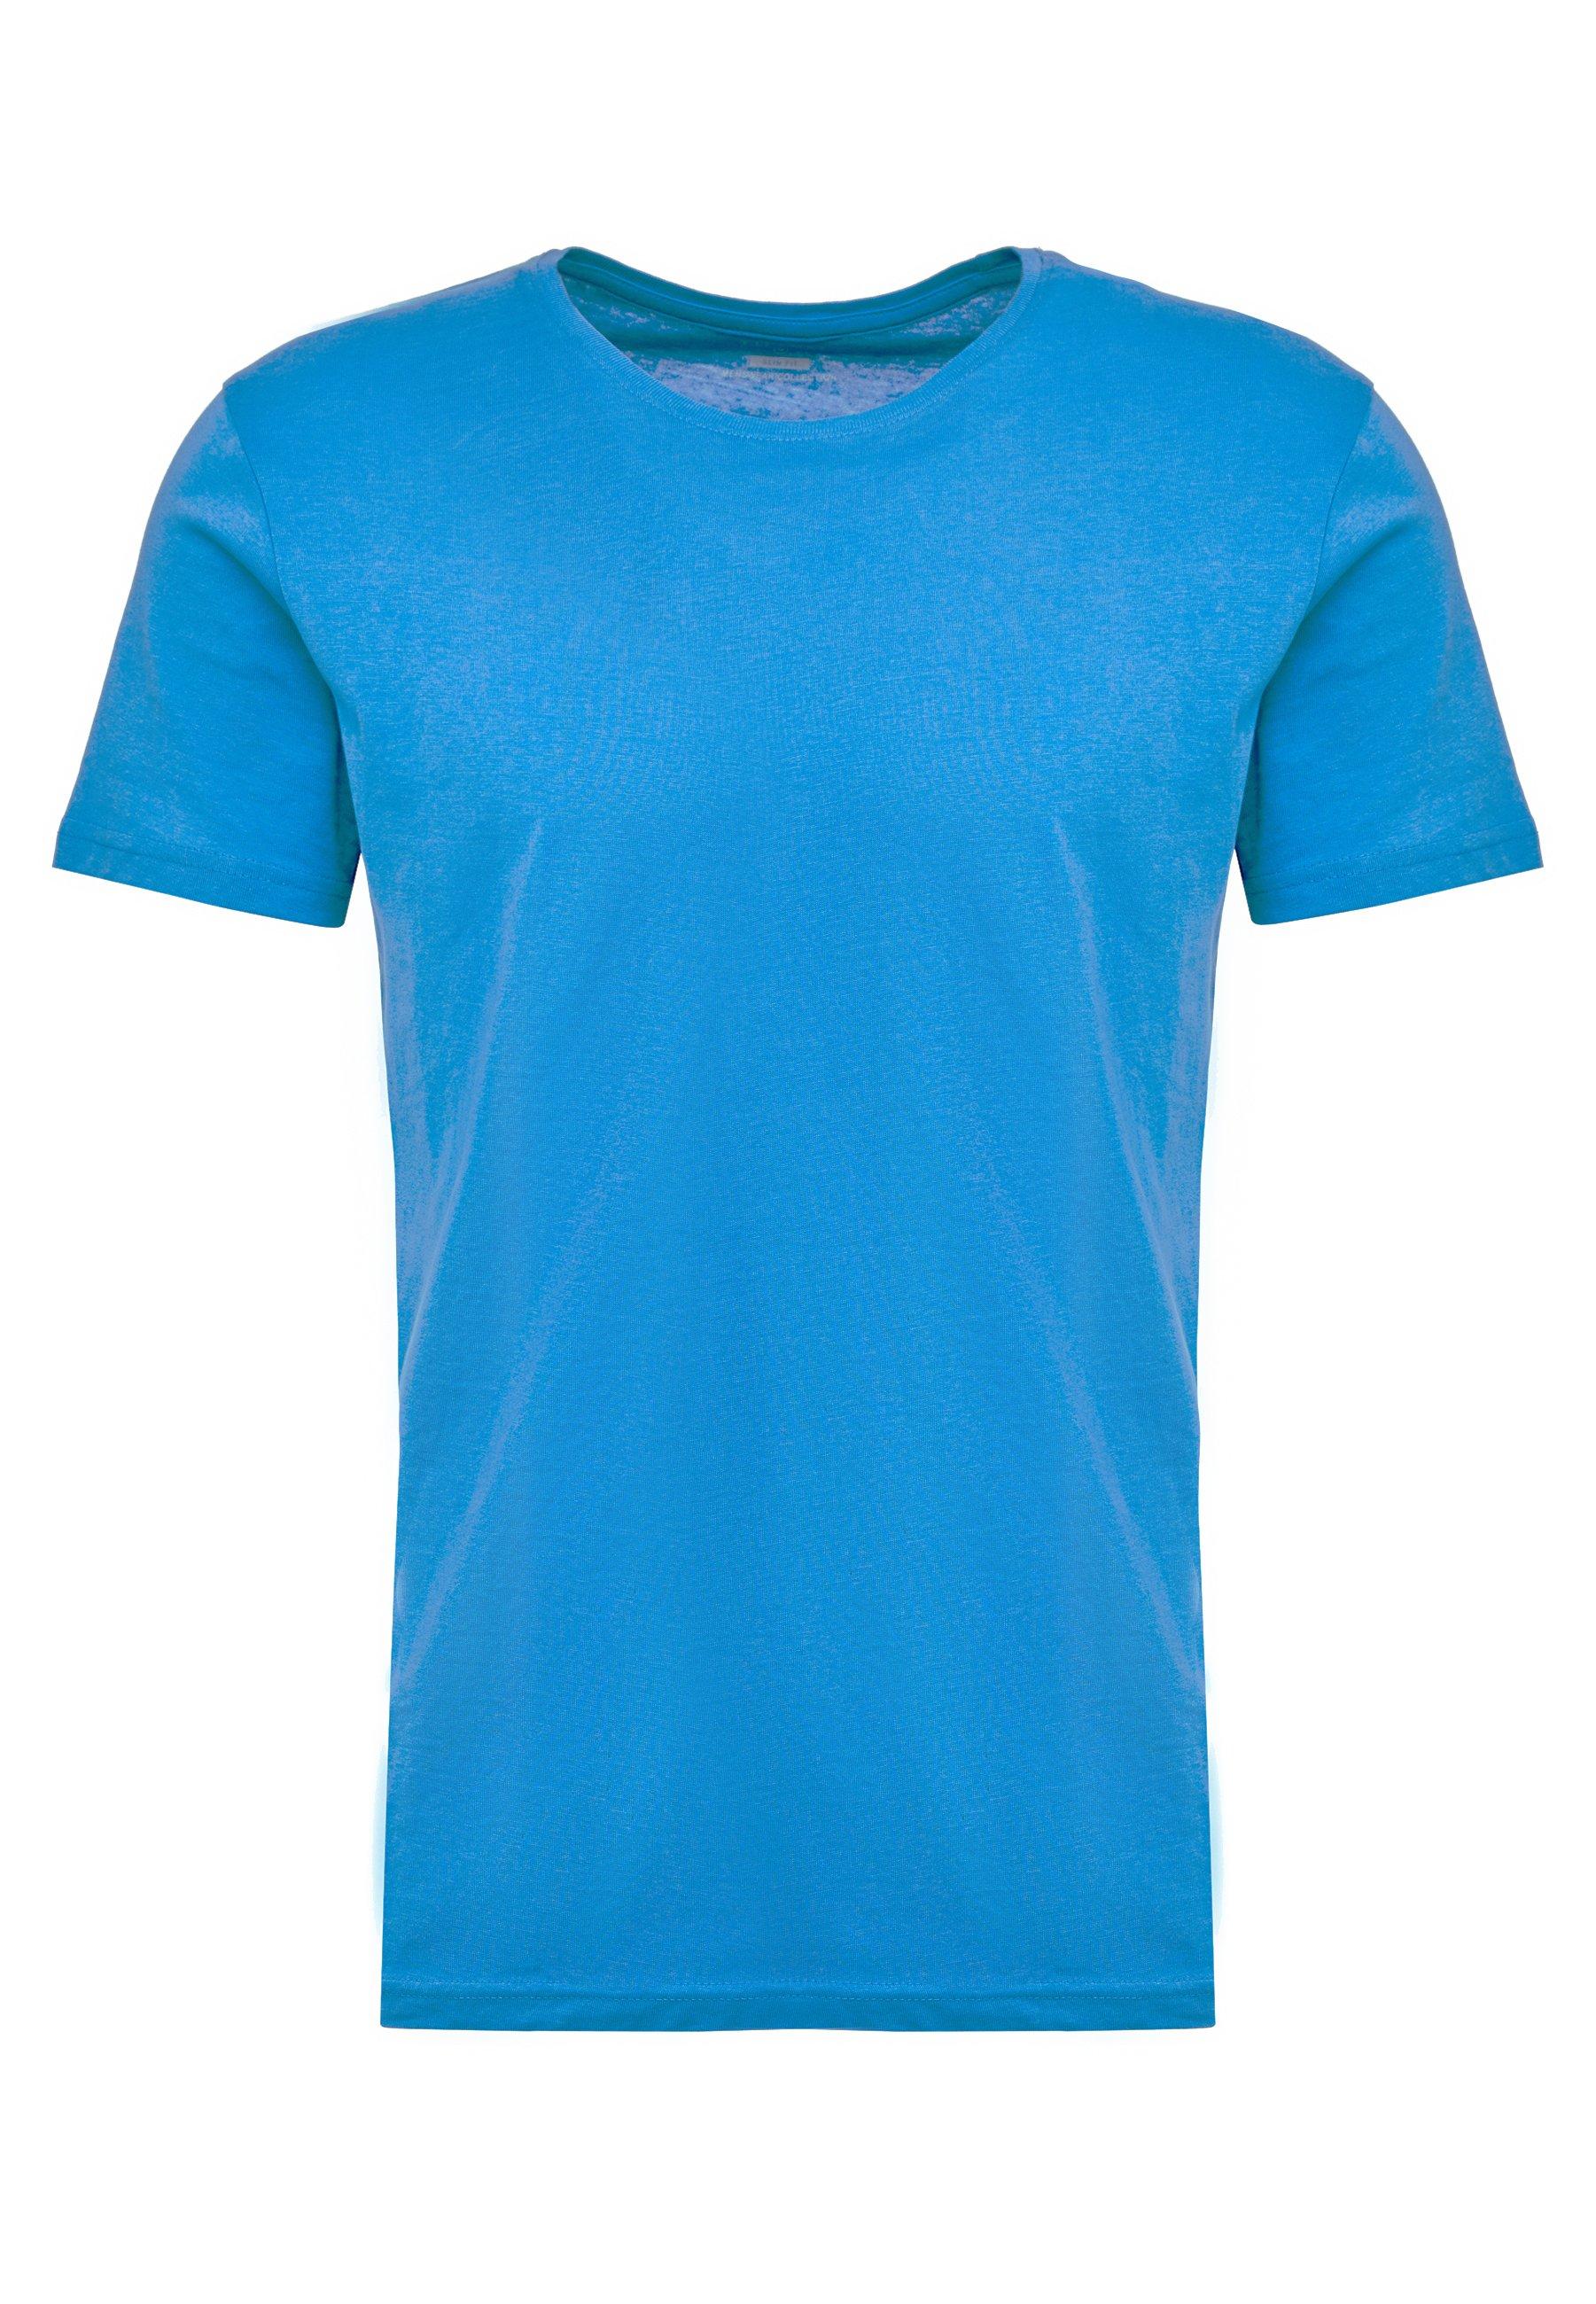 Tiffosi BARTON - T-shirts - white